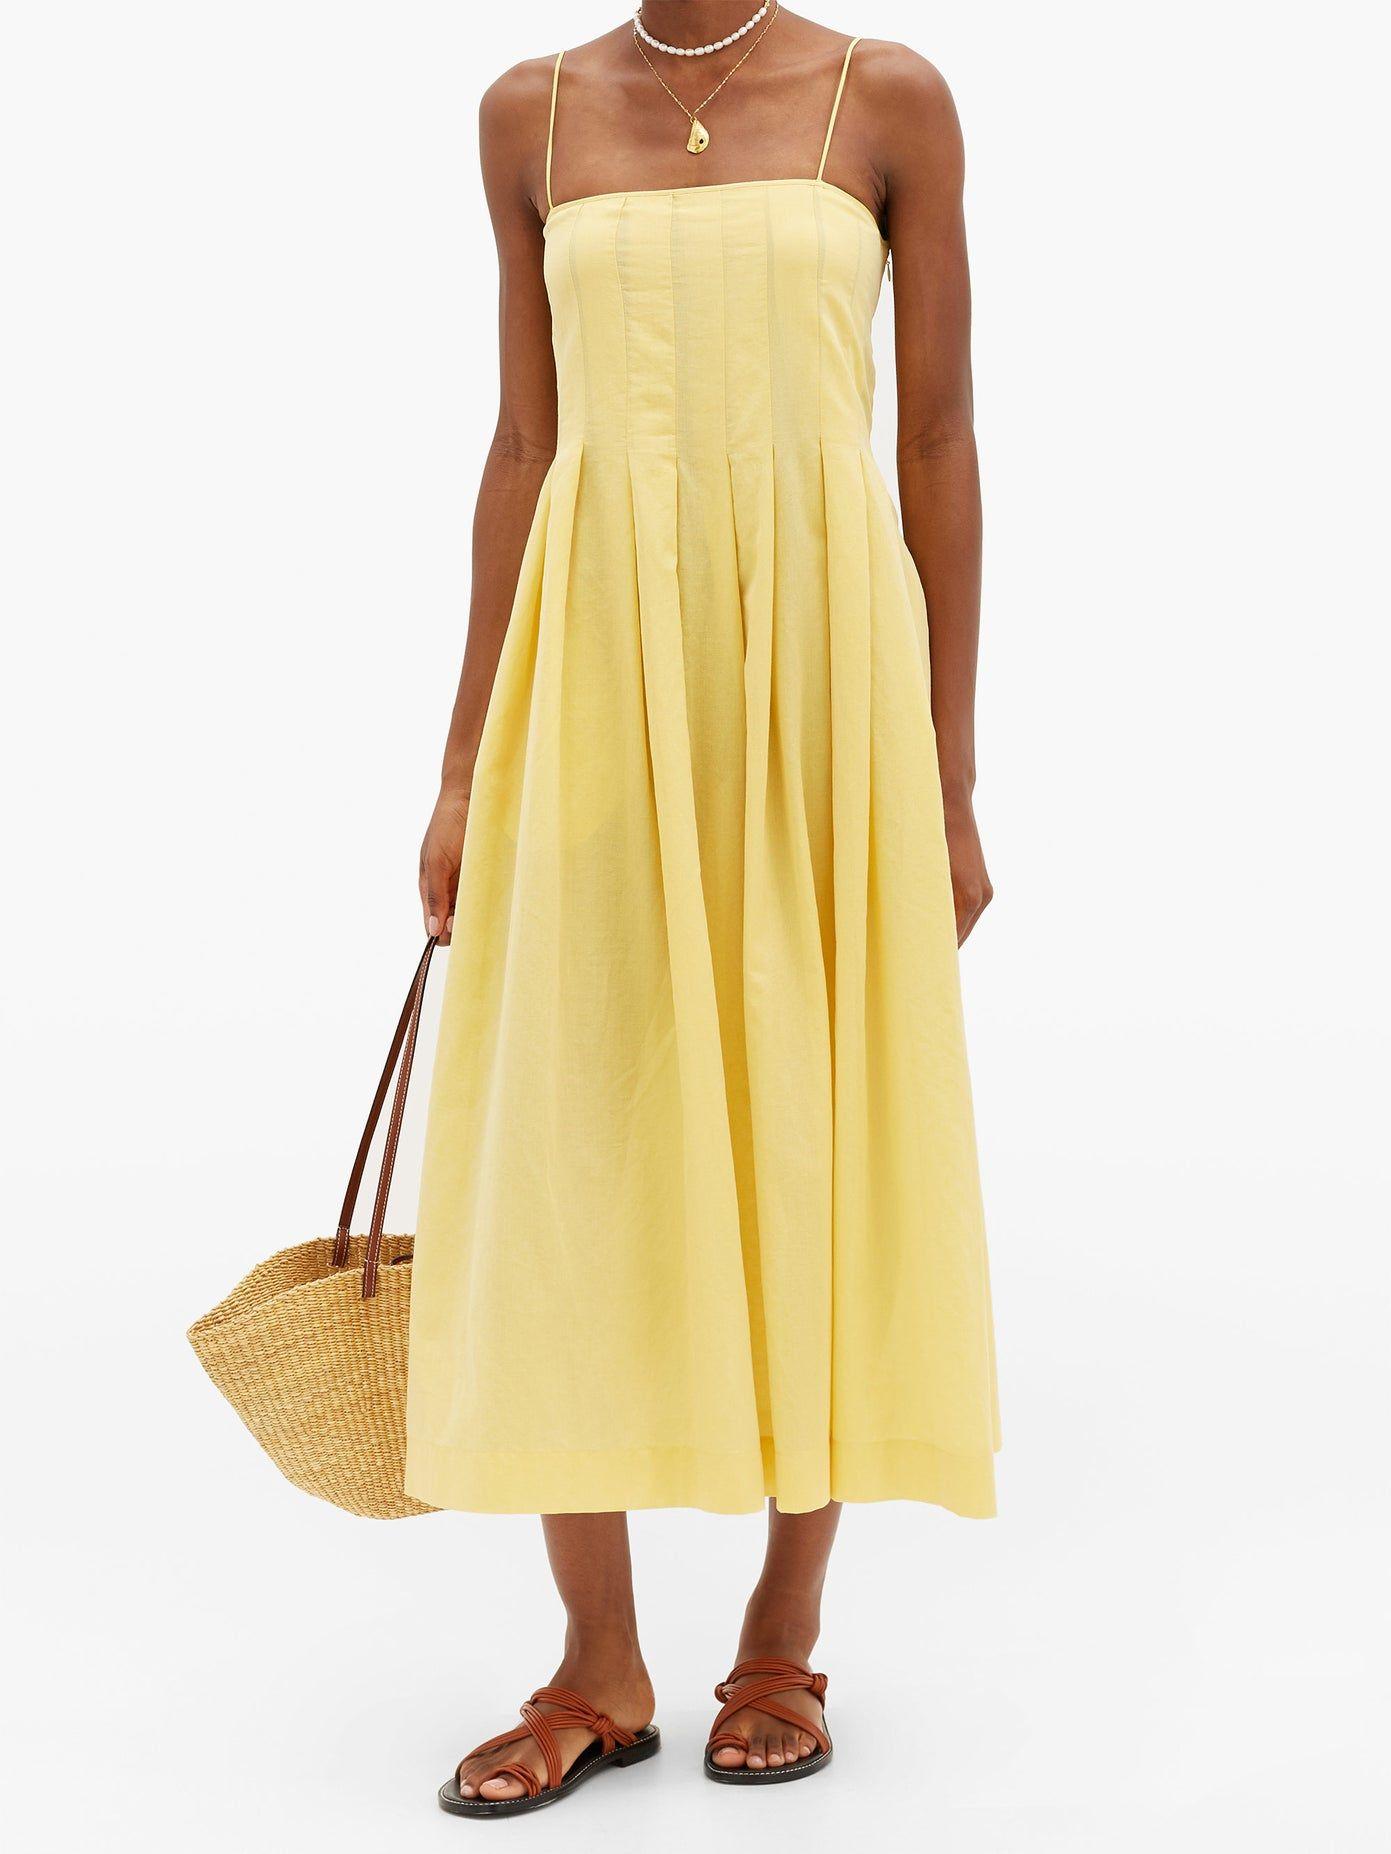 Lucia Pleated Cotton Gauze Maxi Dress Three Graces London Matchesfashion Uk Gauze Maxi Dress Maxi Dress Dresses [ 1854 x 1391 Pixel ]